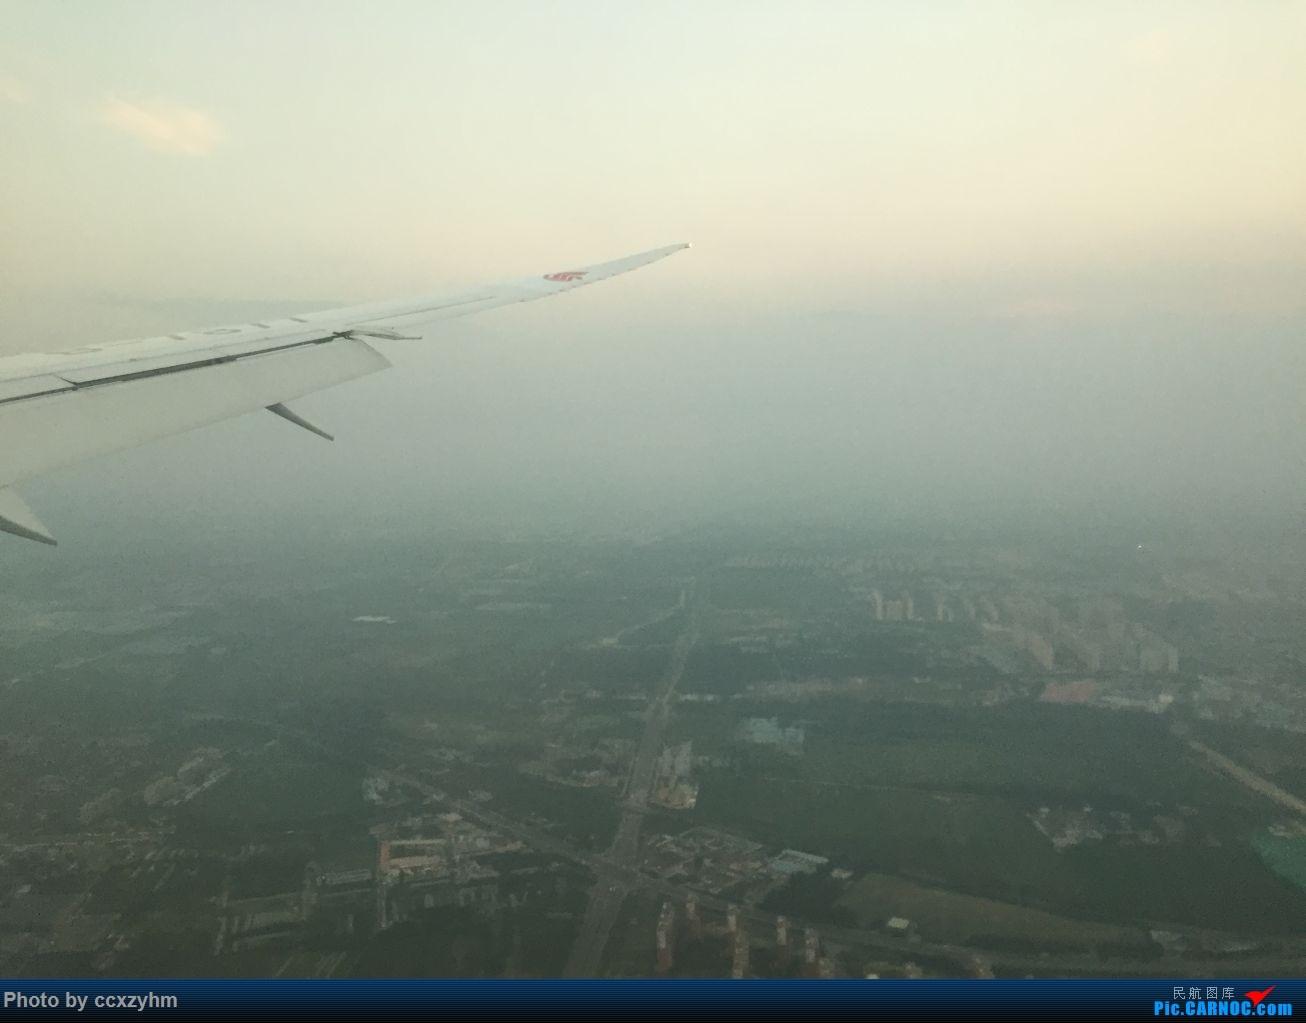 Re:[原创]论坛首发 京沪线上的国航789 高二升高三暑假短Break 空铁联运去北京 BOEING 787-9 B-7877 天上